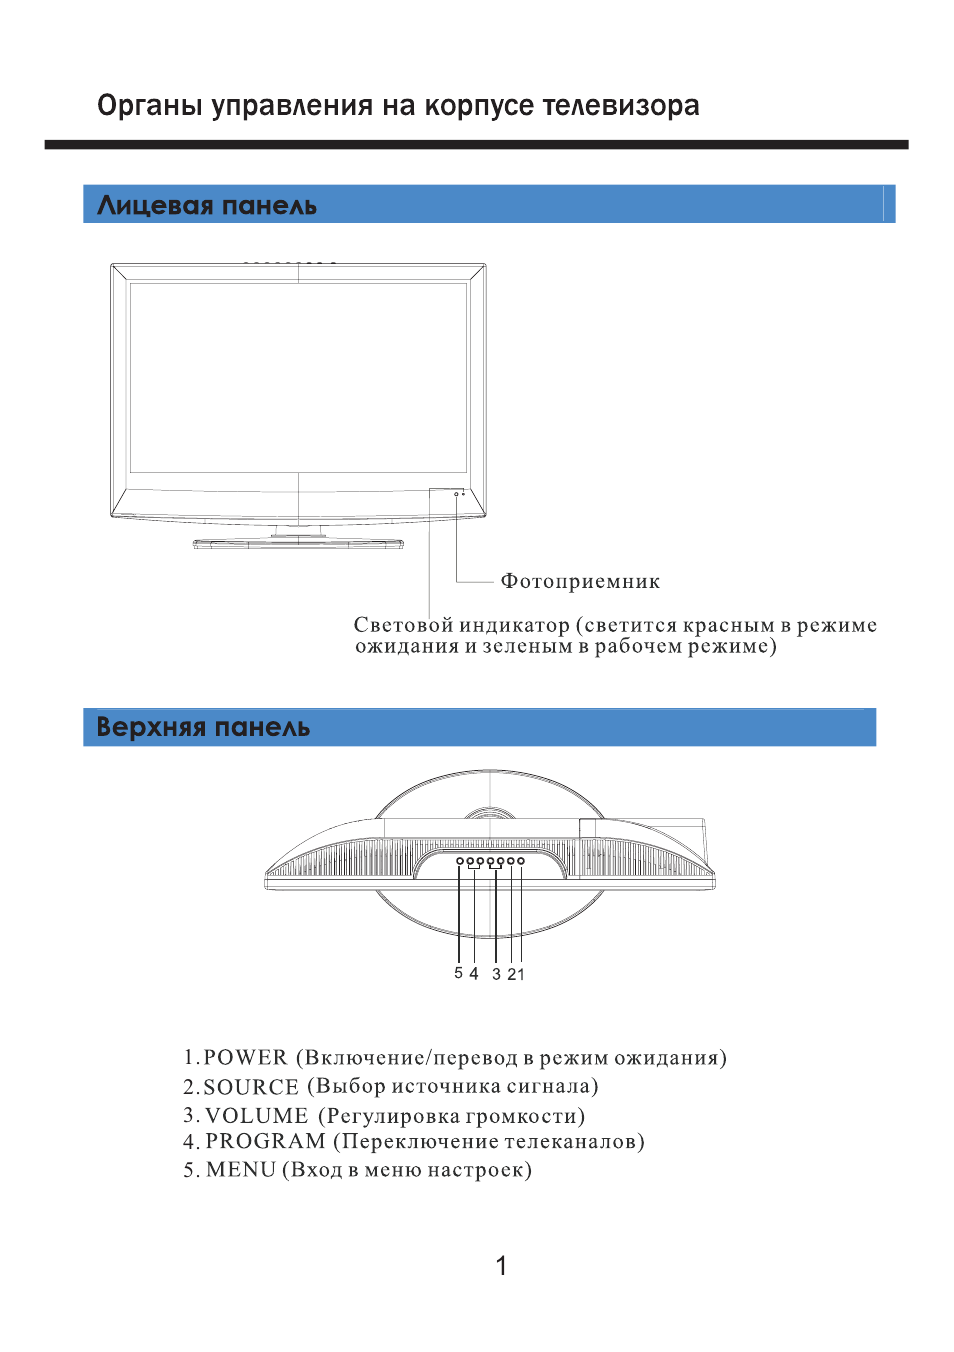 Телевизор полар инструкция